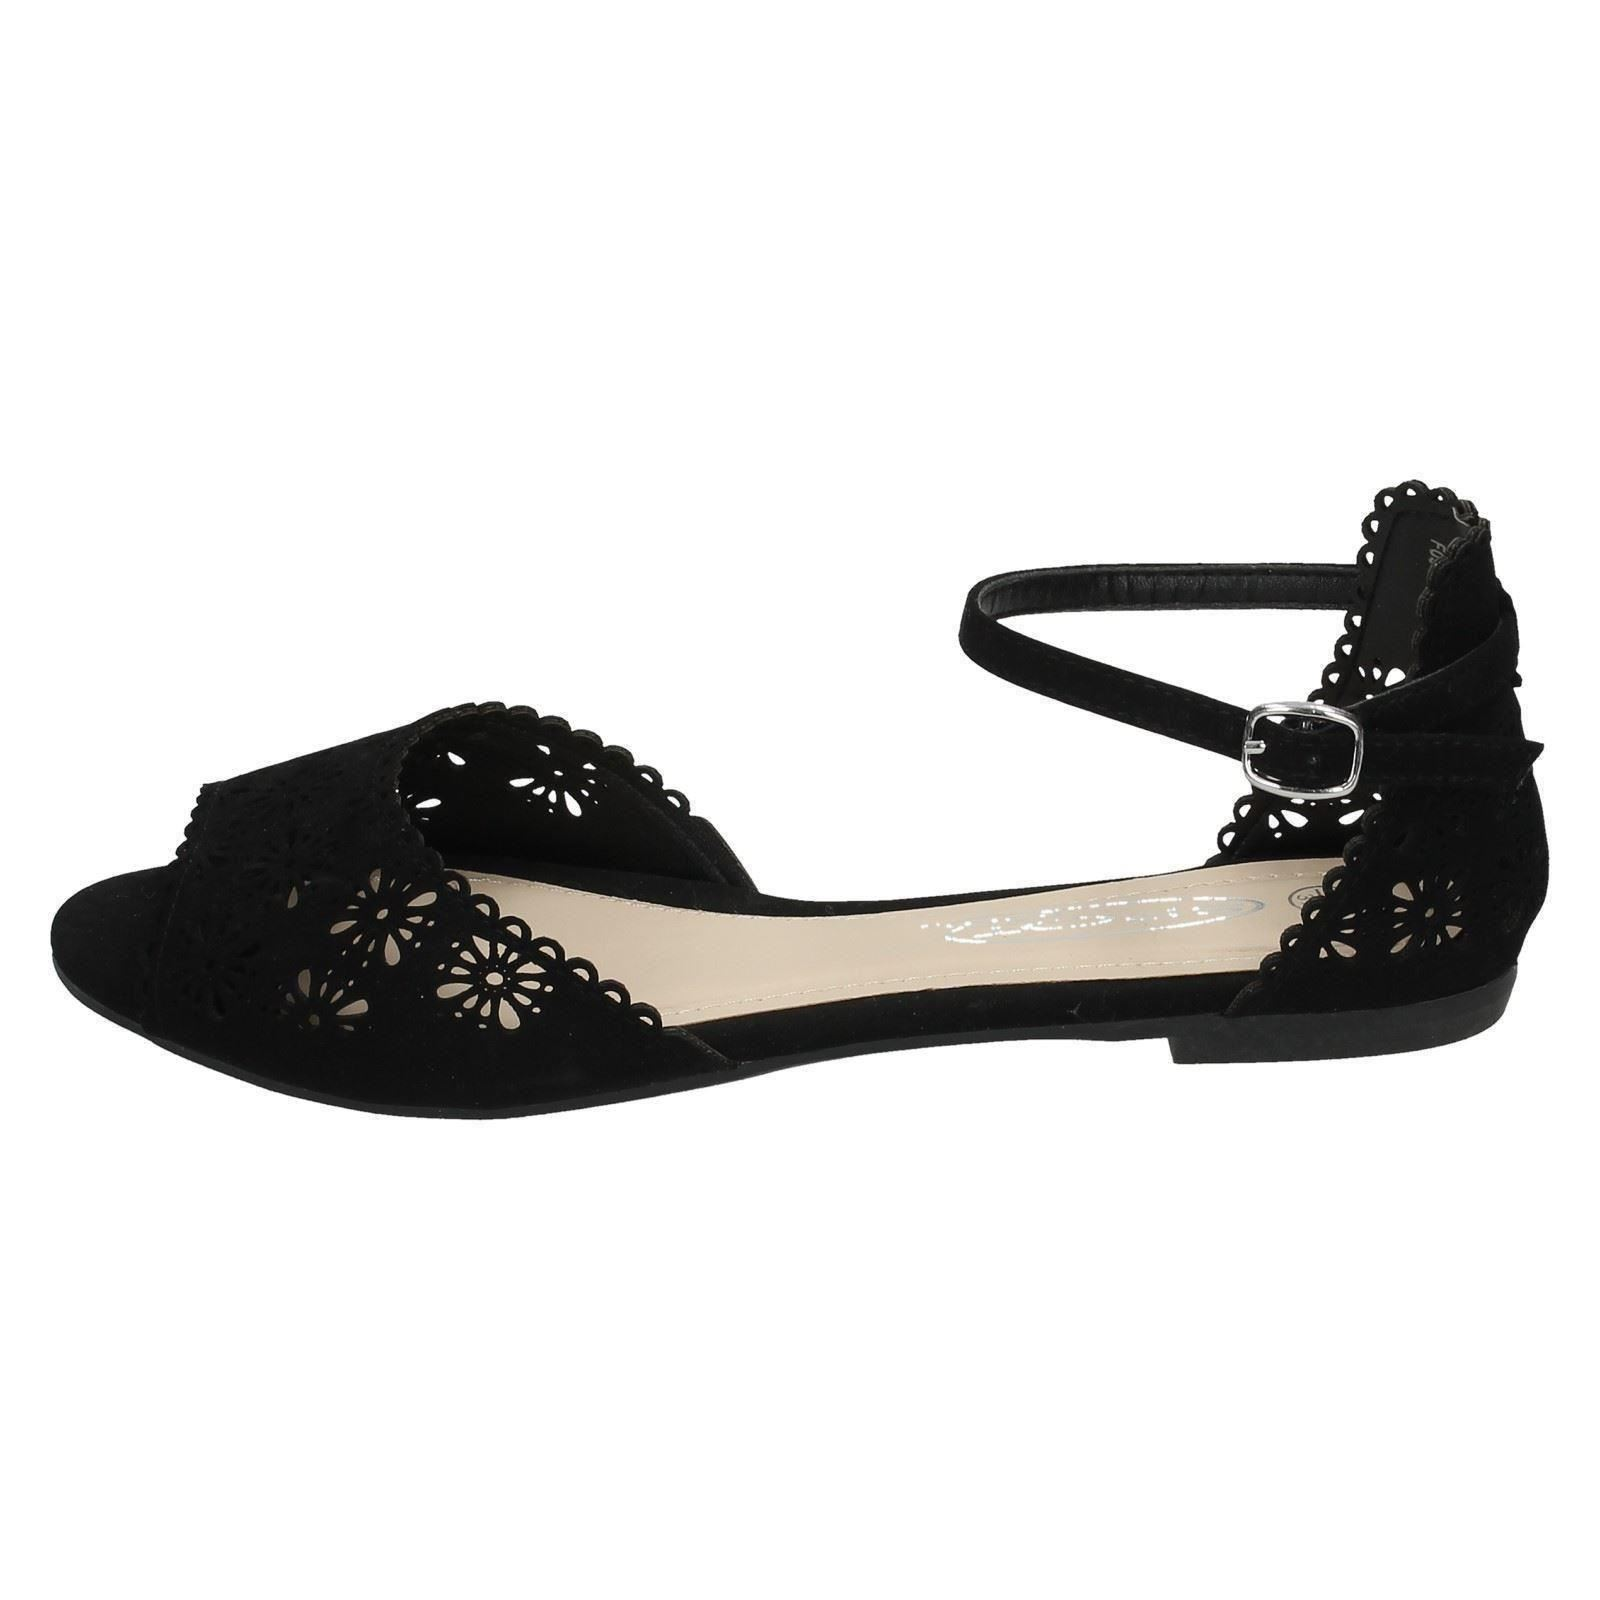 Ladies Spot On Knotted Vamp Sandal